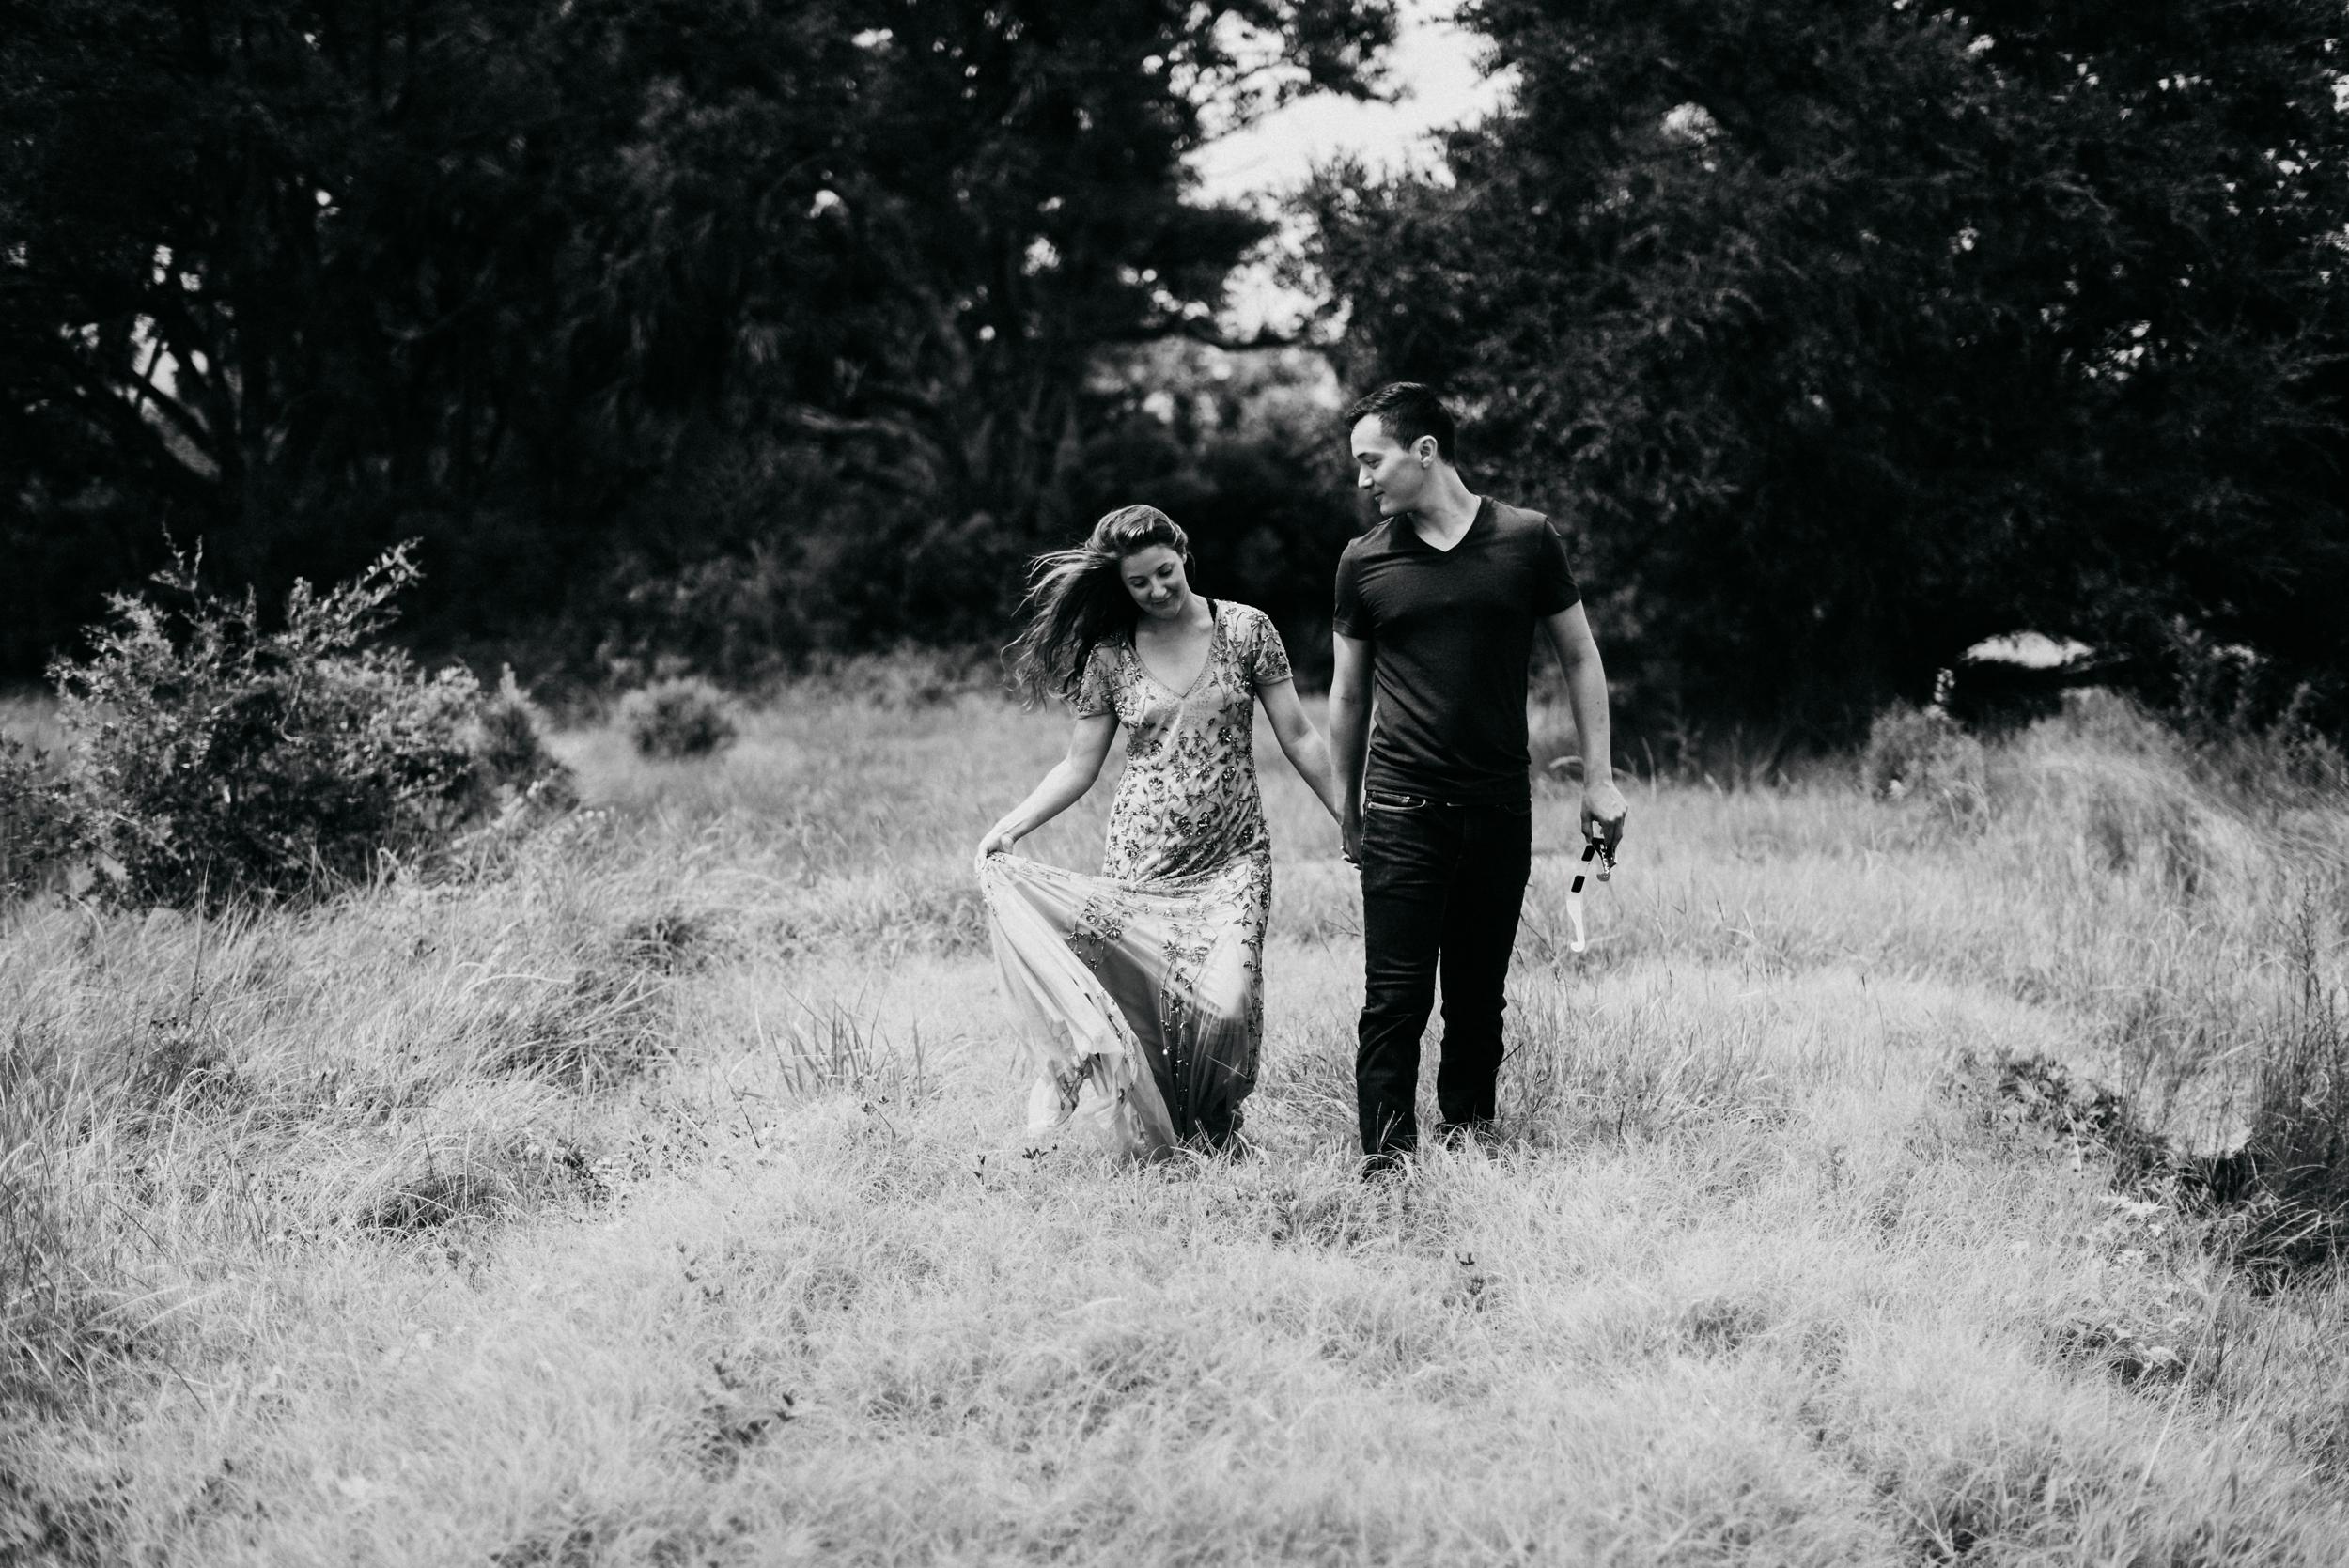 desiree-gardner-photography-pairs-france-monet-garden-monets-couple-wedding-engagement-giverny-30-a-30a-florida_0053.jpg